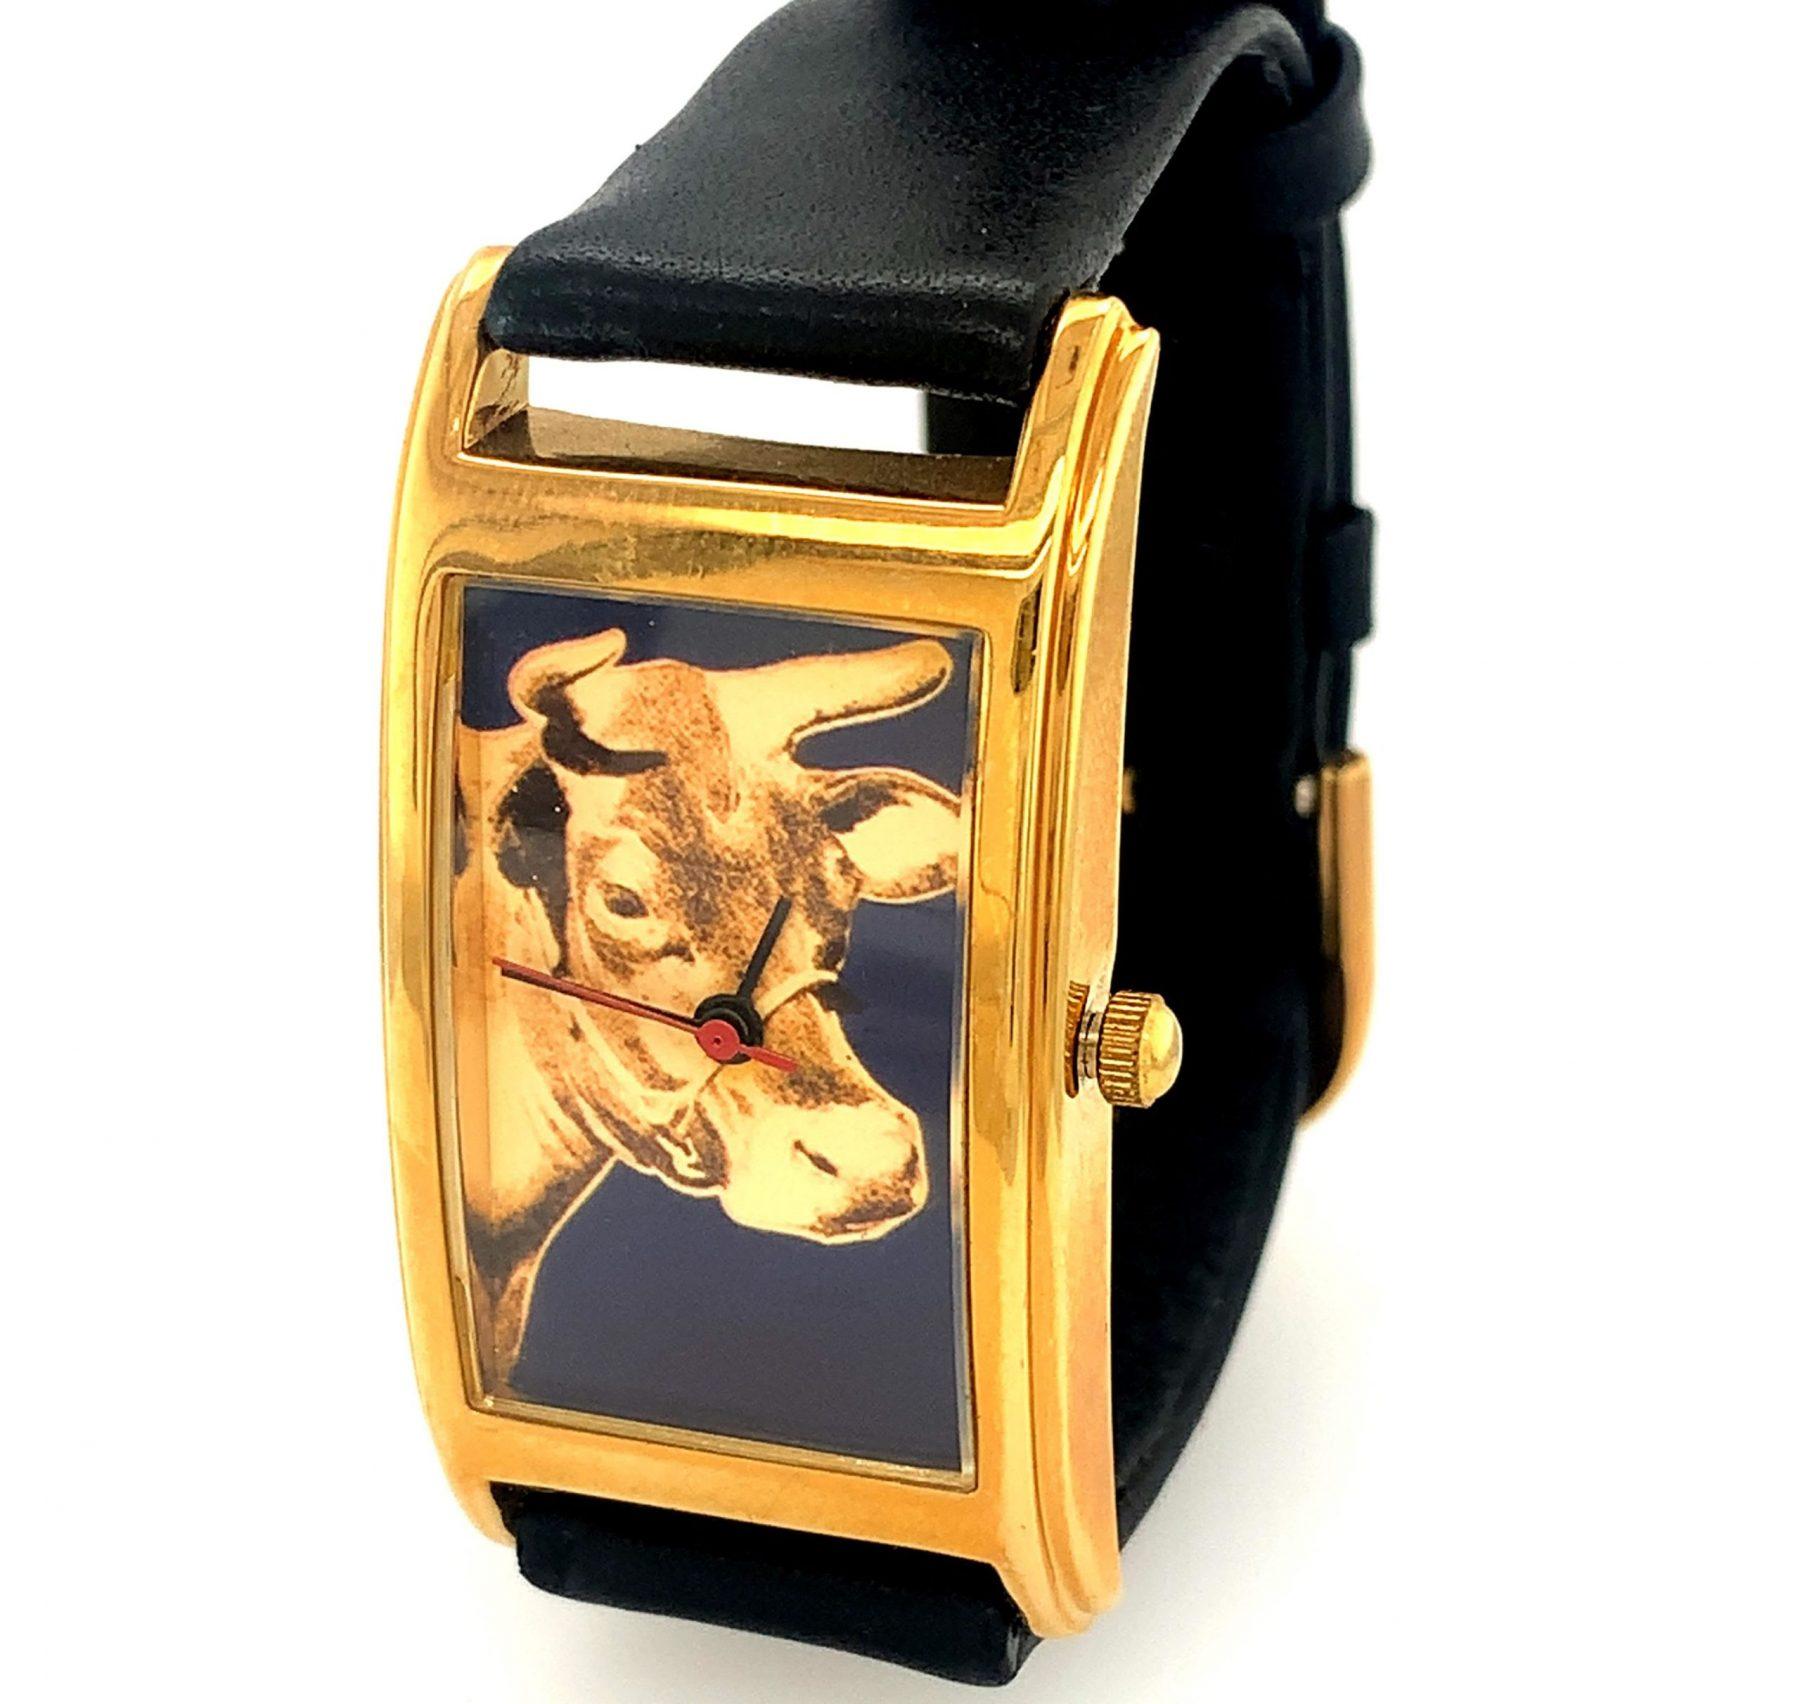 Uhr - Warhol, Andy - k-11905